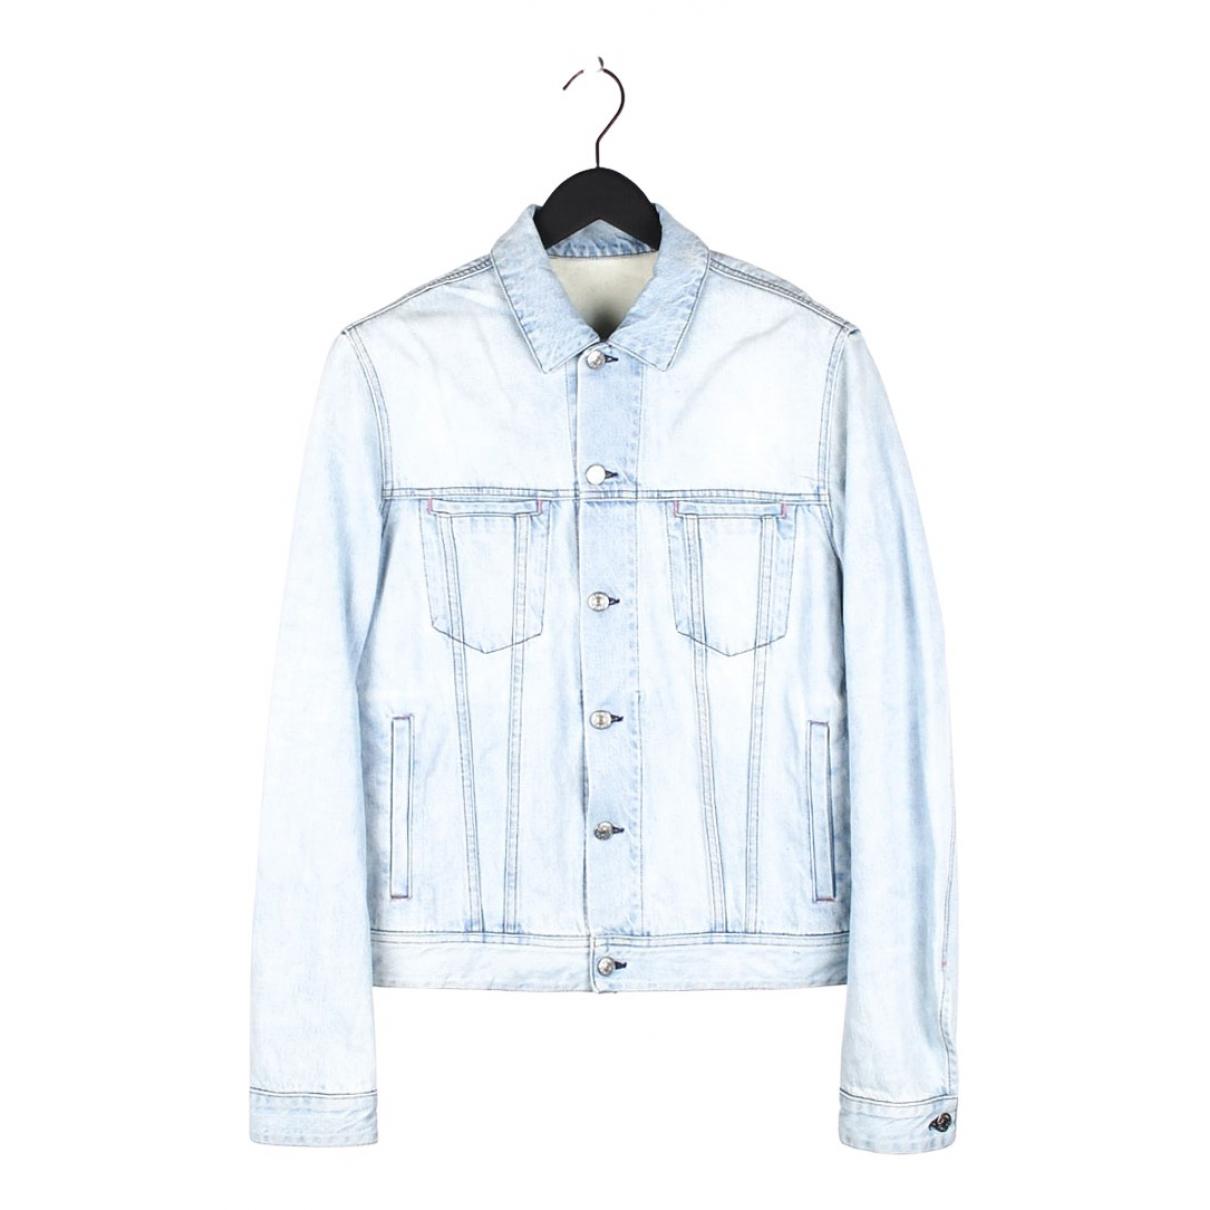 Acne Studios N Blue Cotton jacket  for Men M International